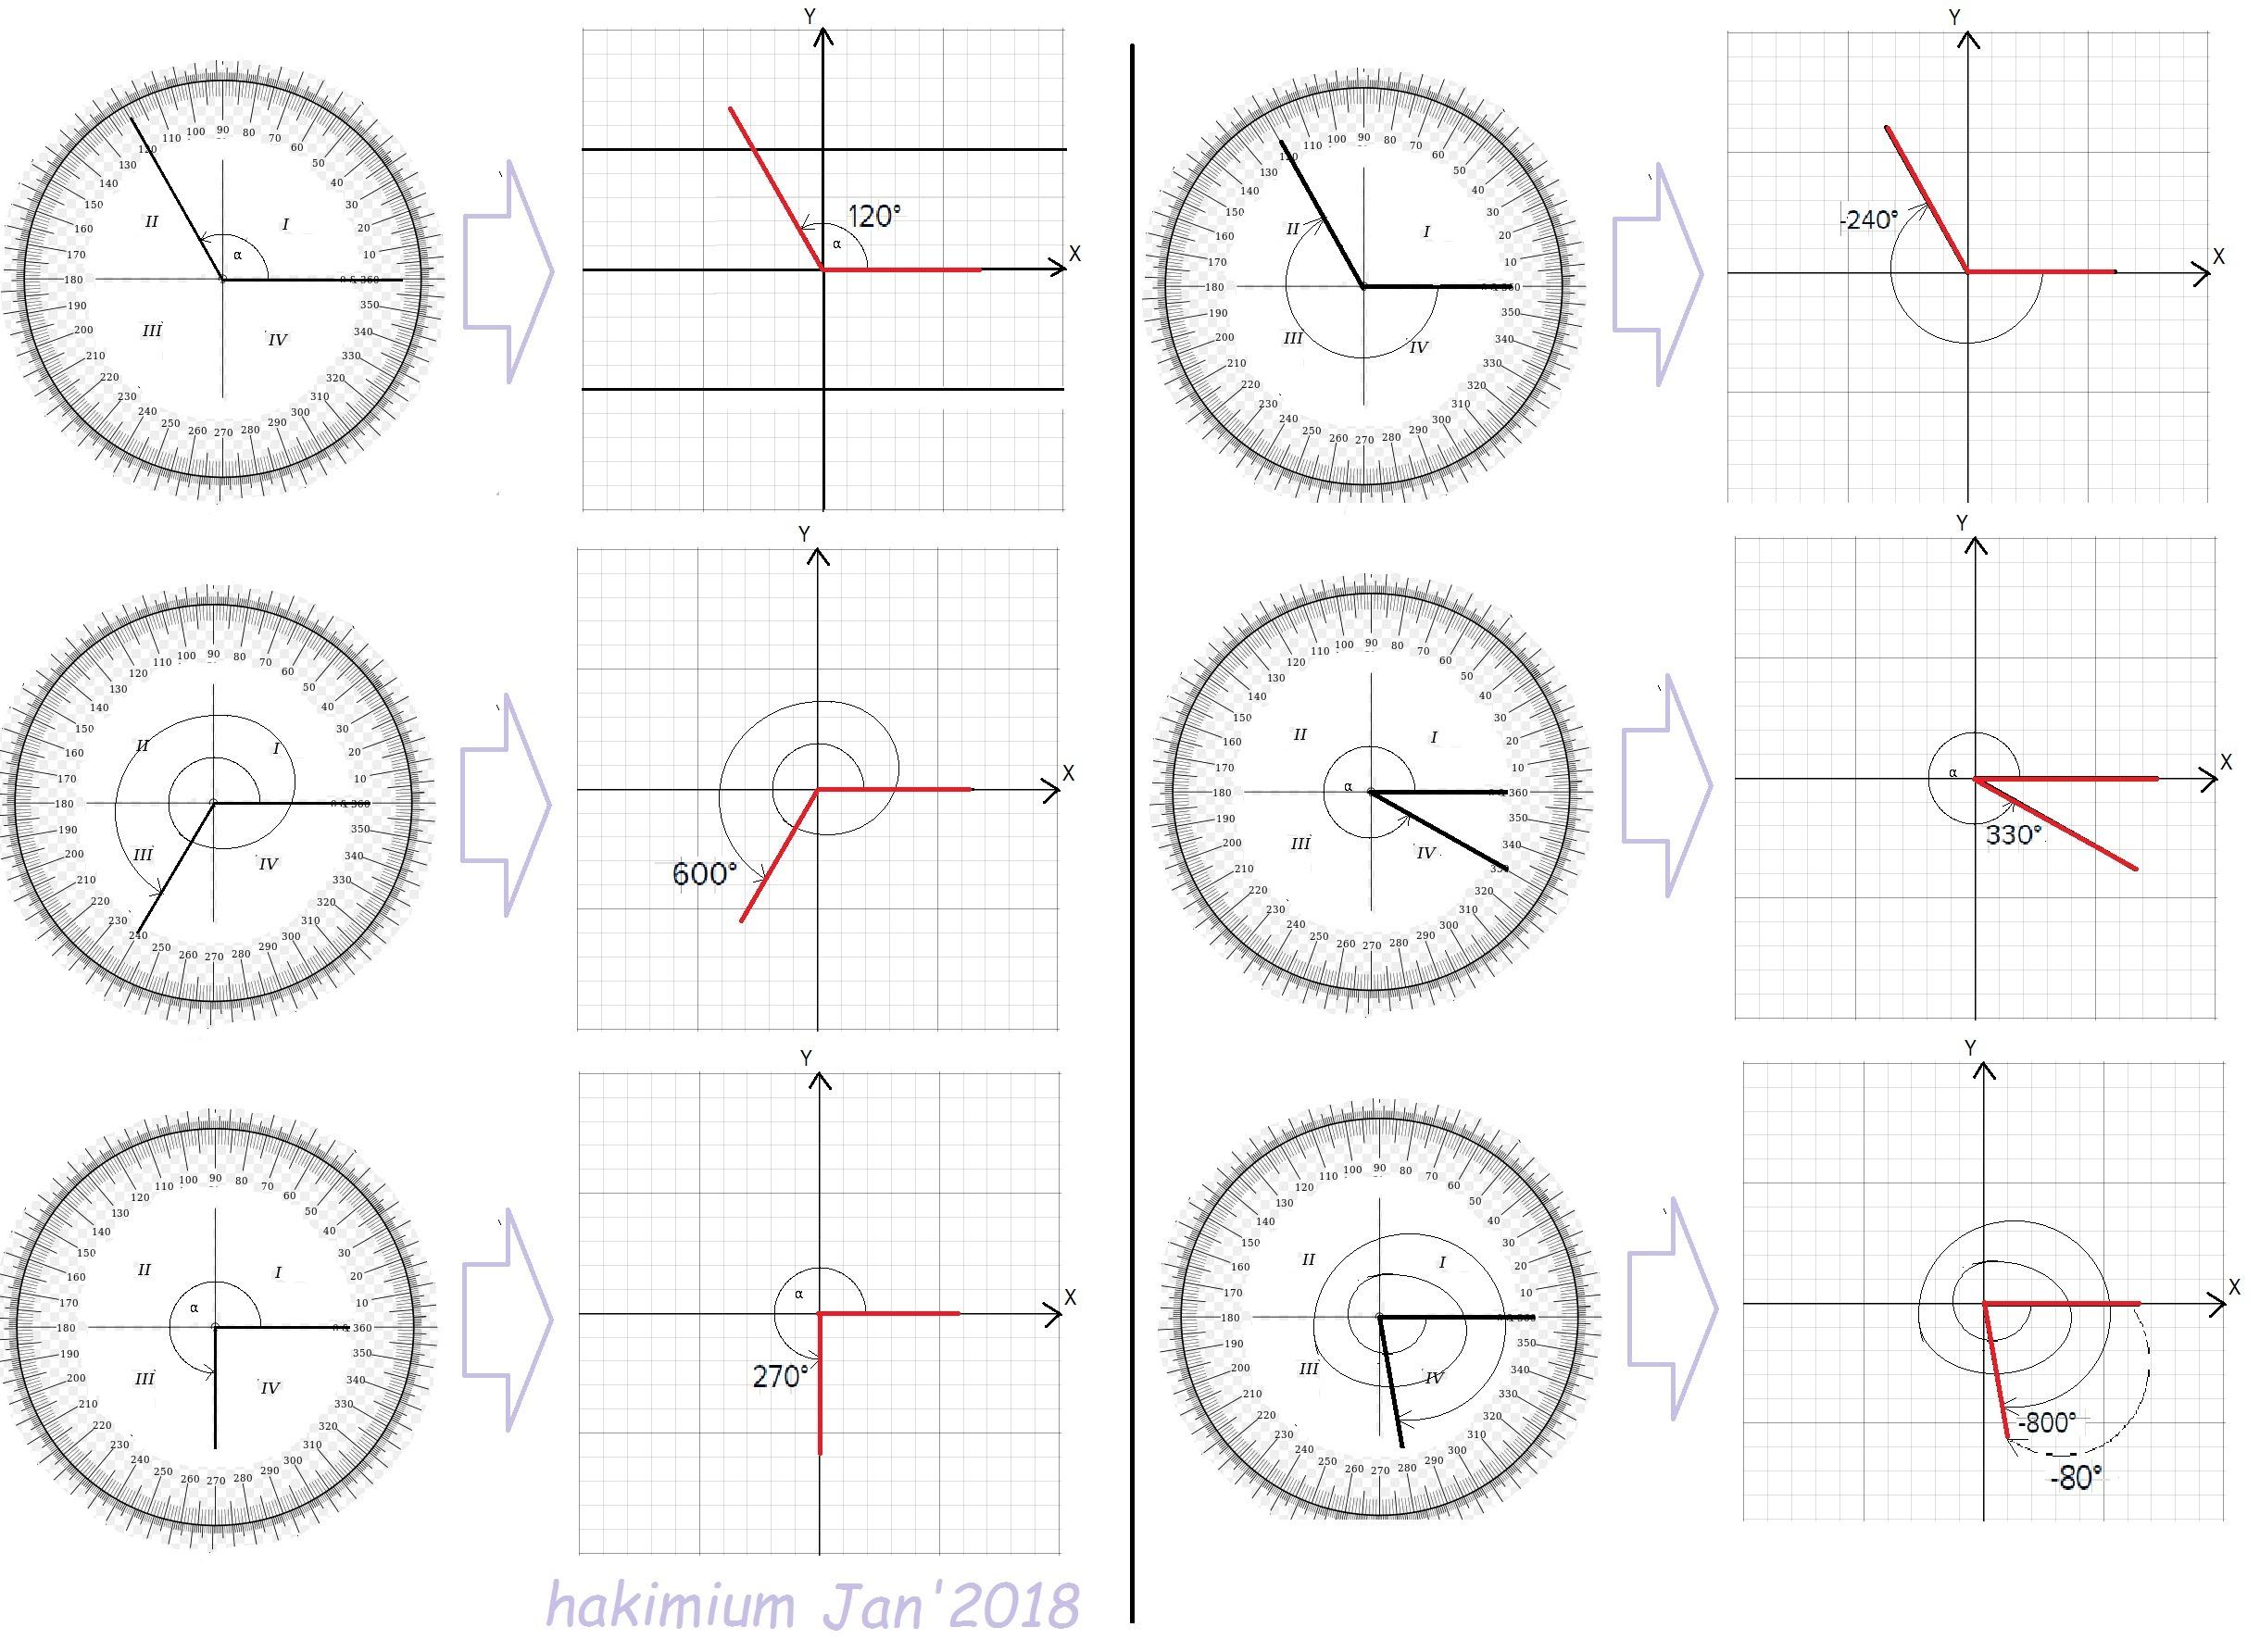 Gambarkan setiap ukuran sudut dibawah ini dalam koordinat kartesius unduh png ccuart Images